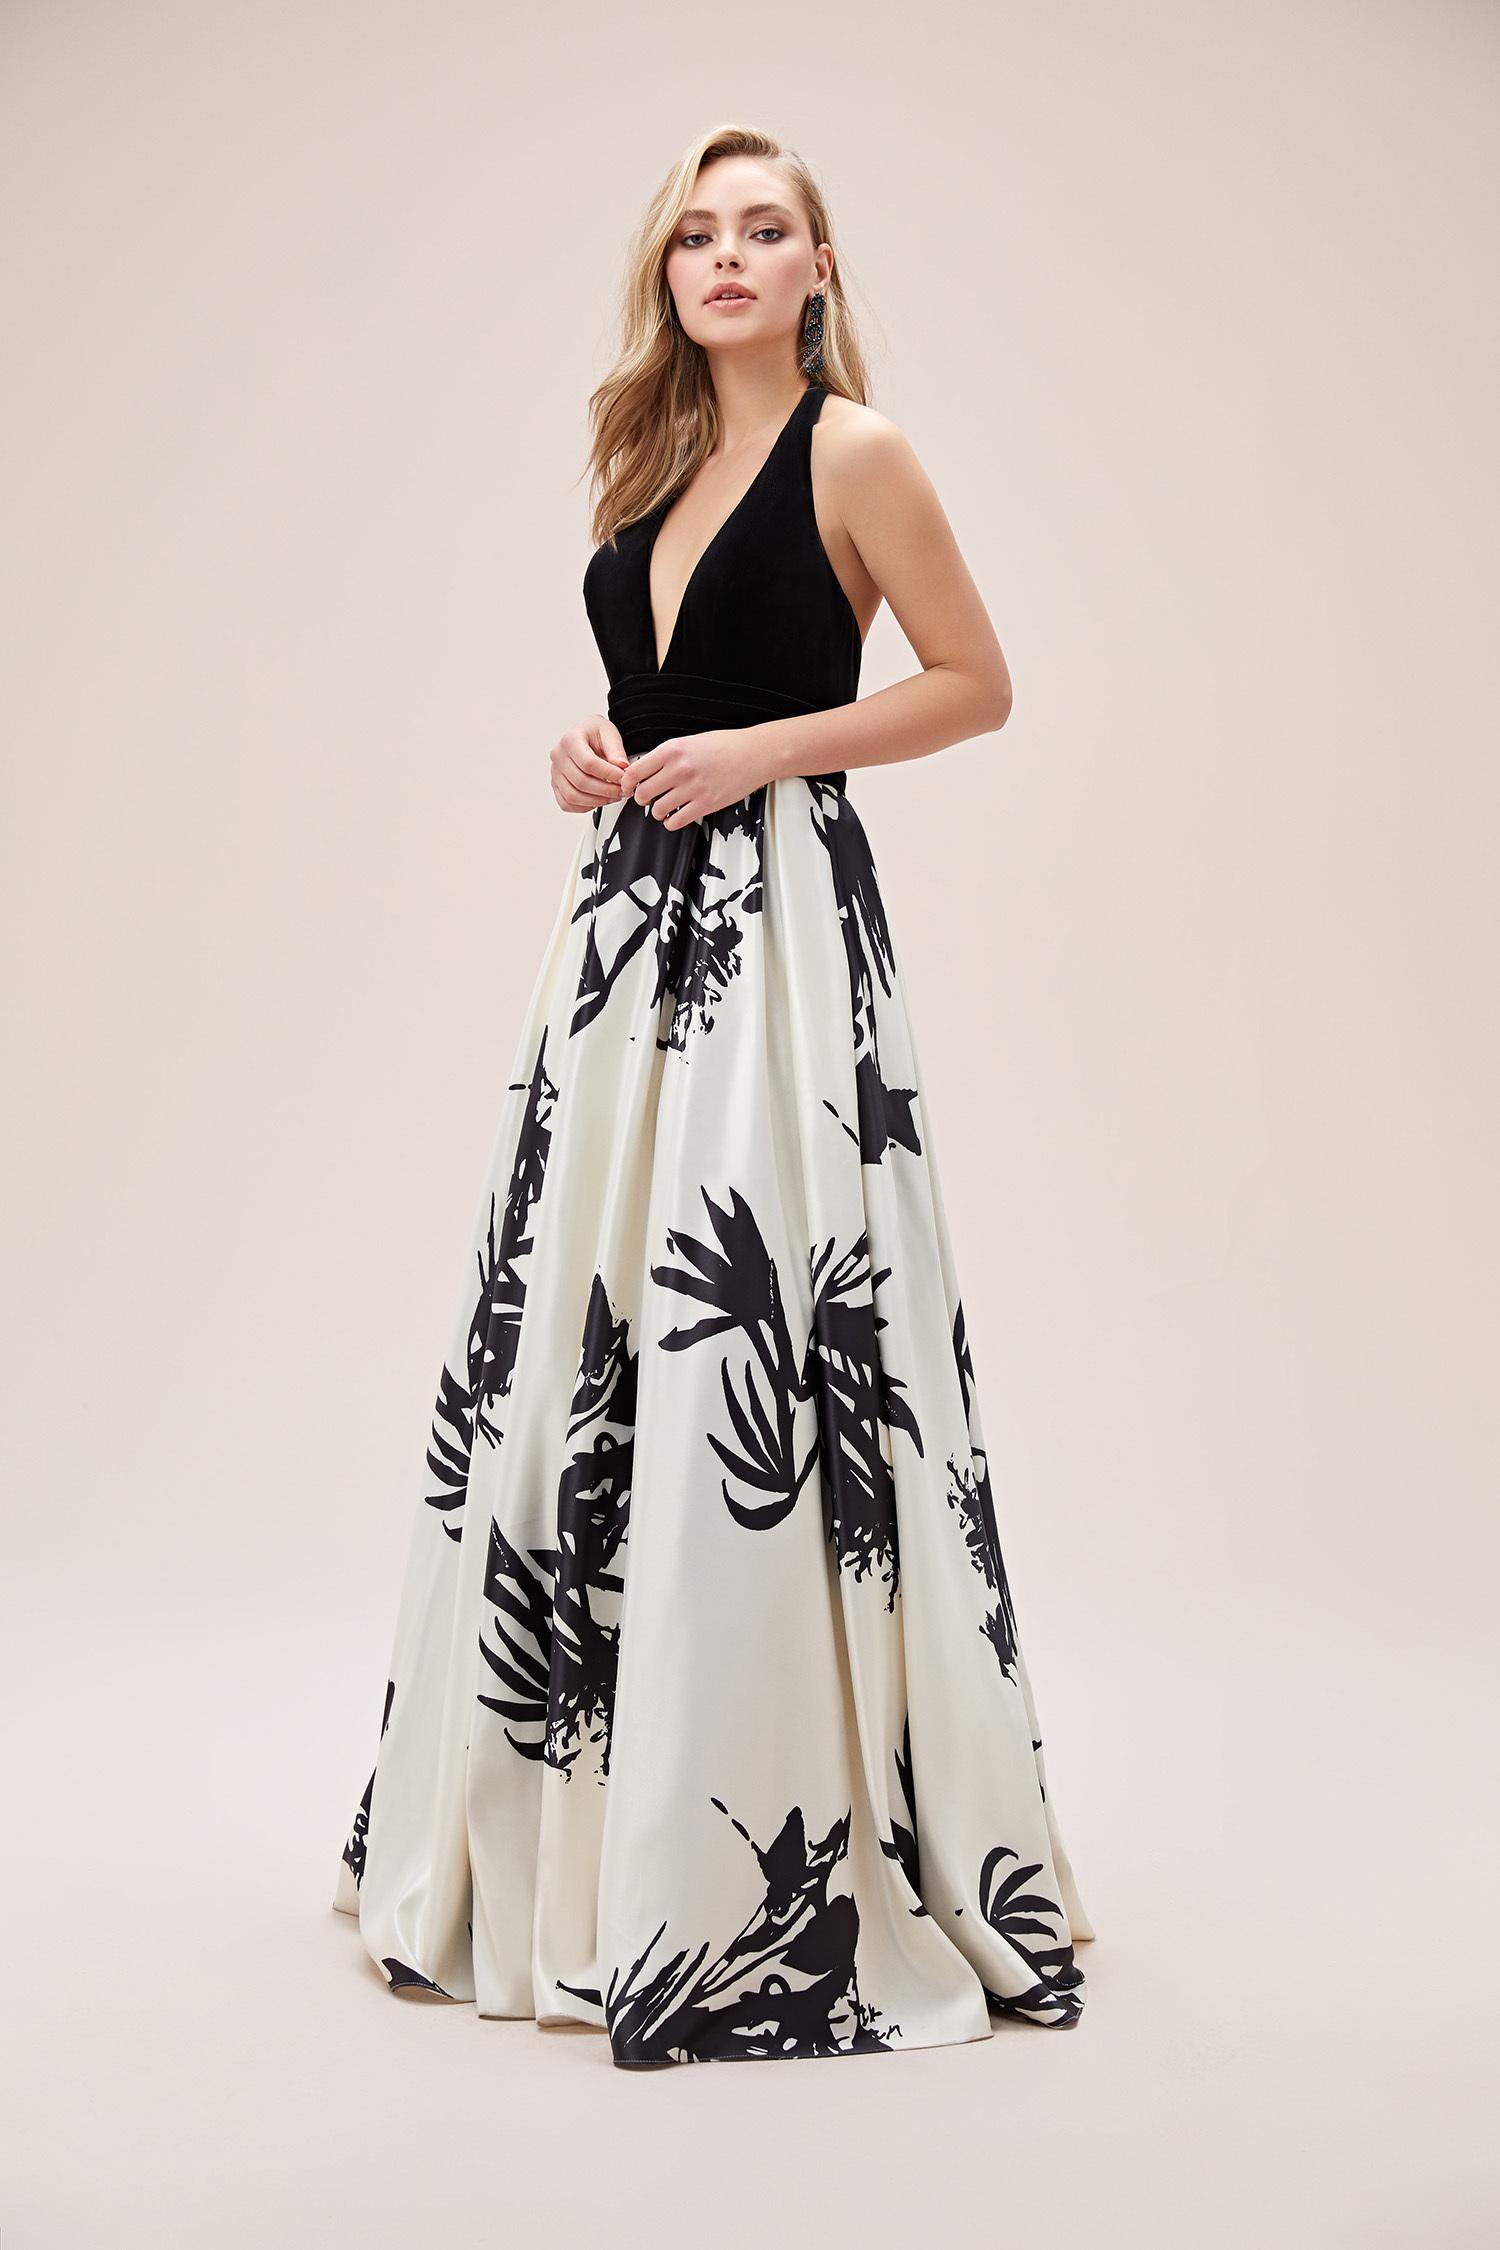 Siyah Beyaz Derin V Yaka Saten Uzun Abiye Elbise - Thumbnail